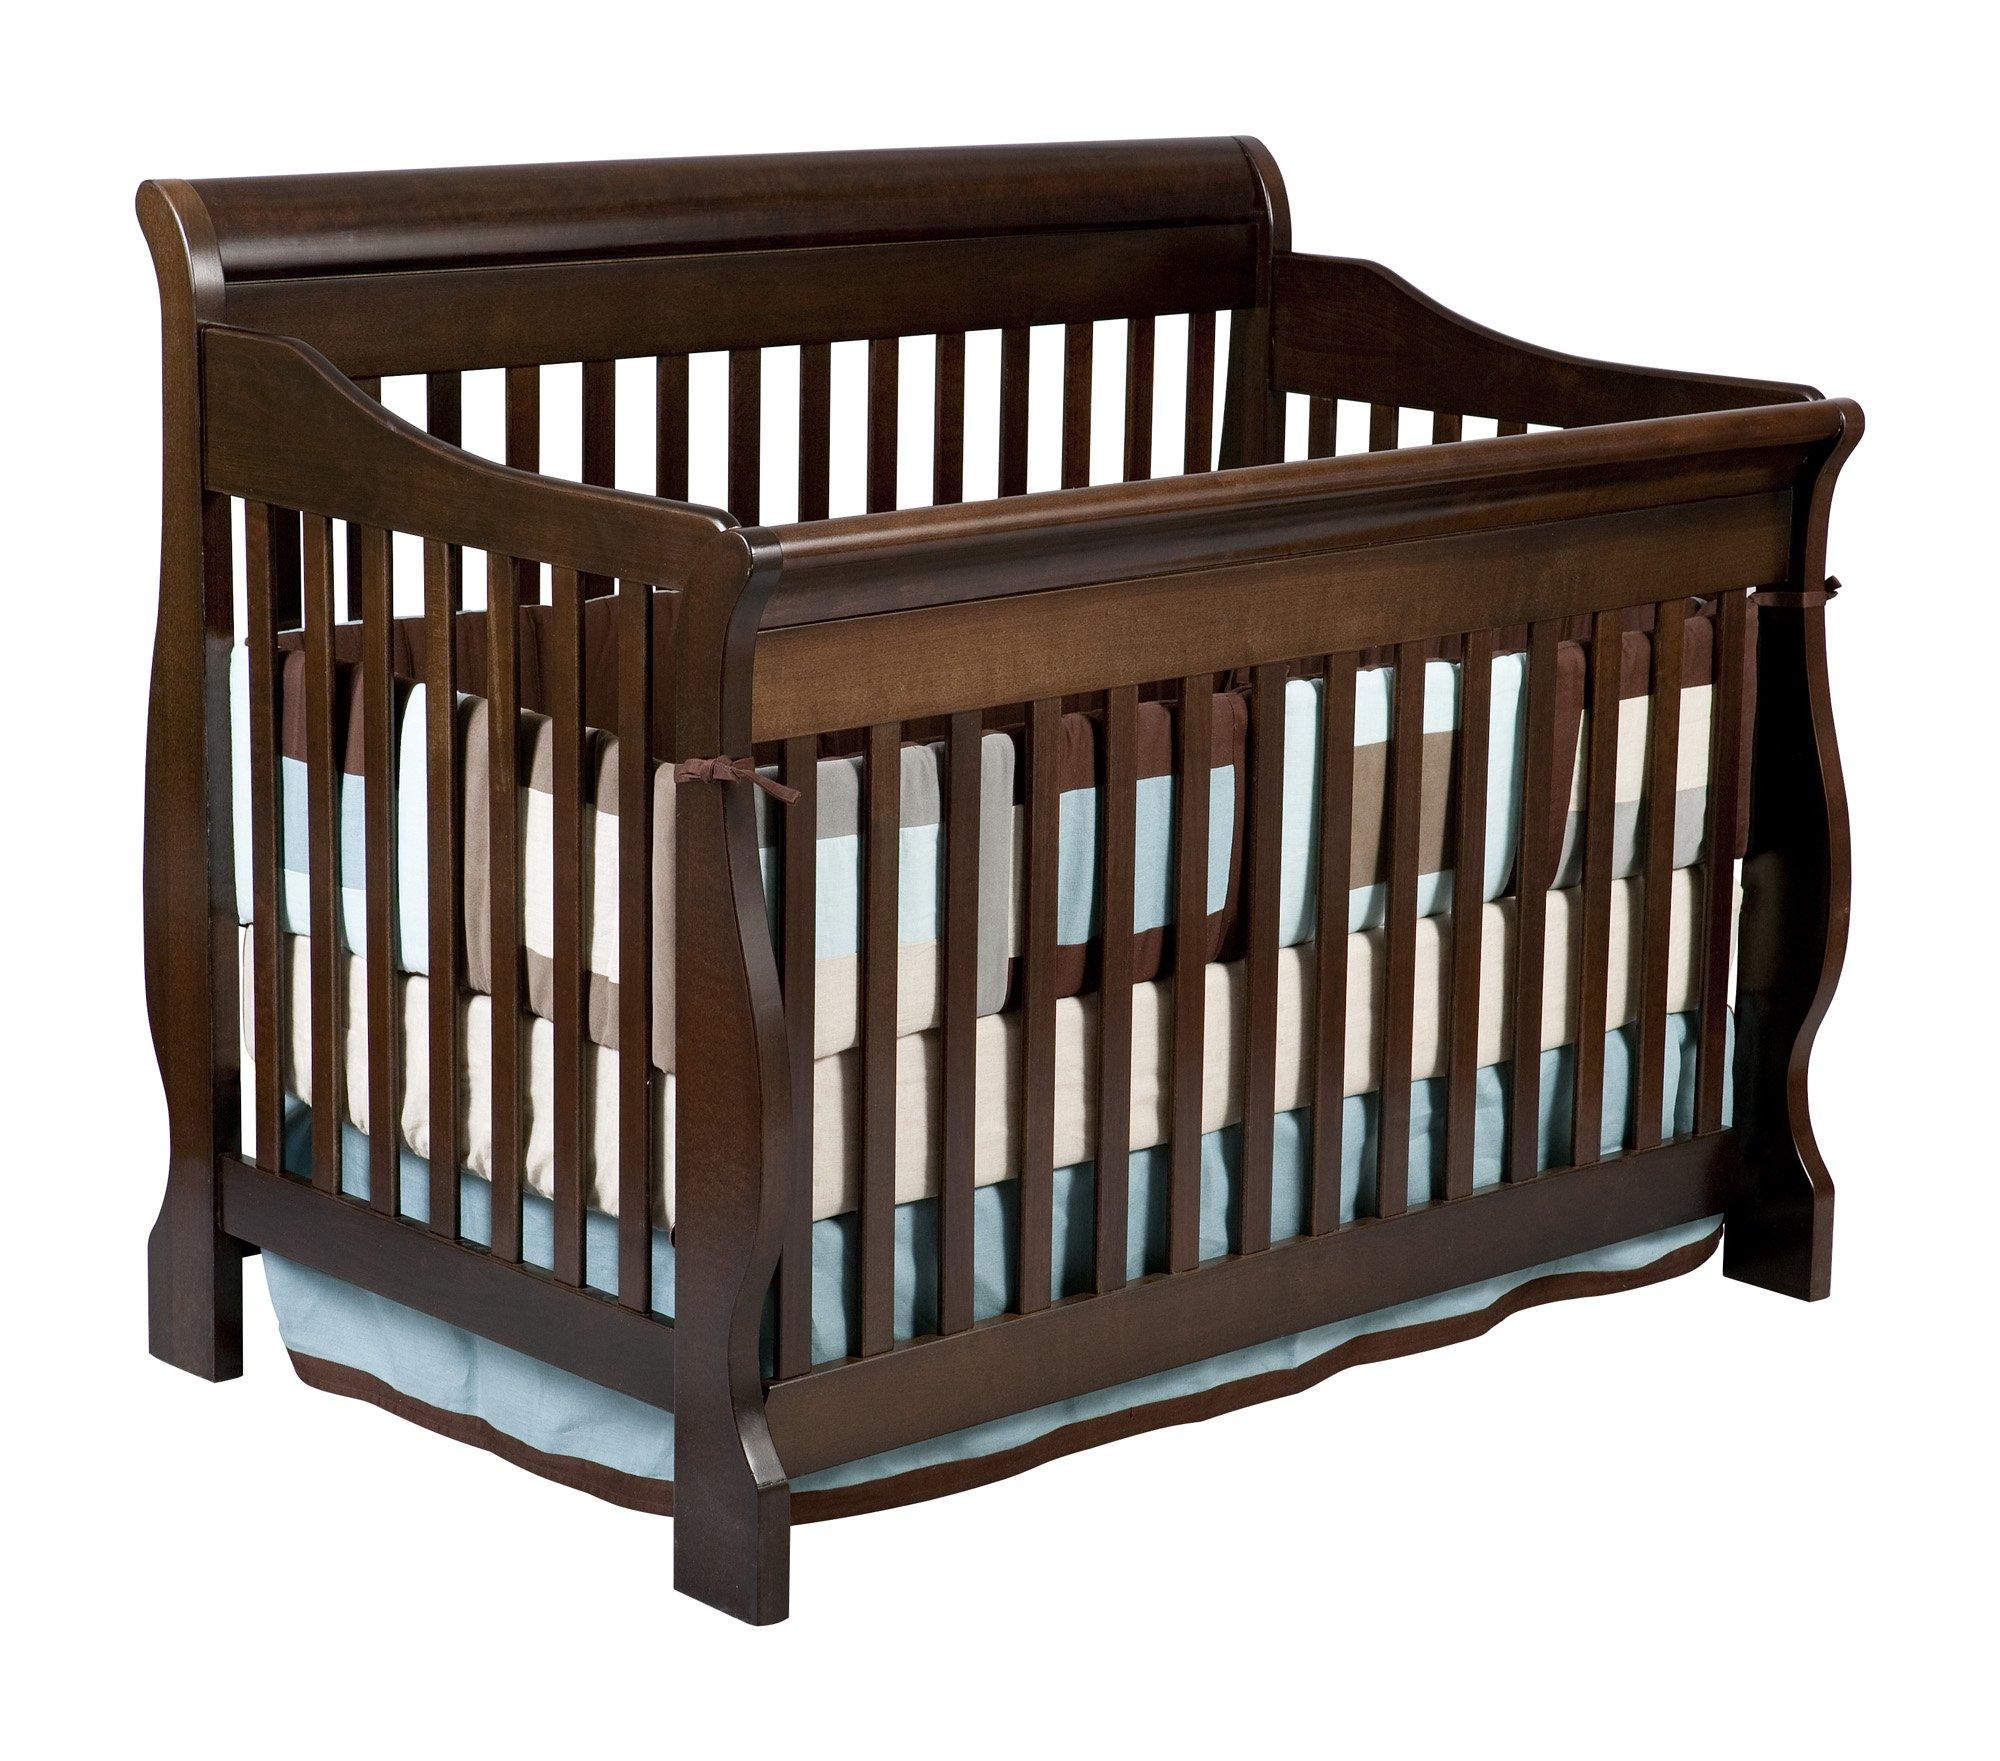 Galleon delta children canton 4 in 1 convertible crib for Child craft crib recall